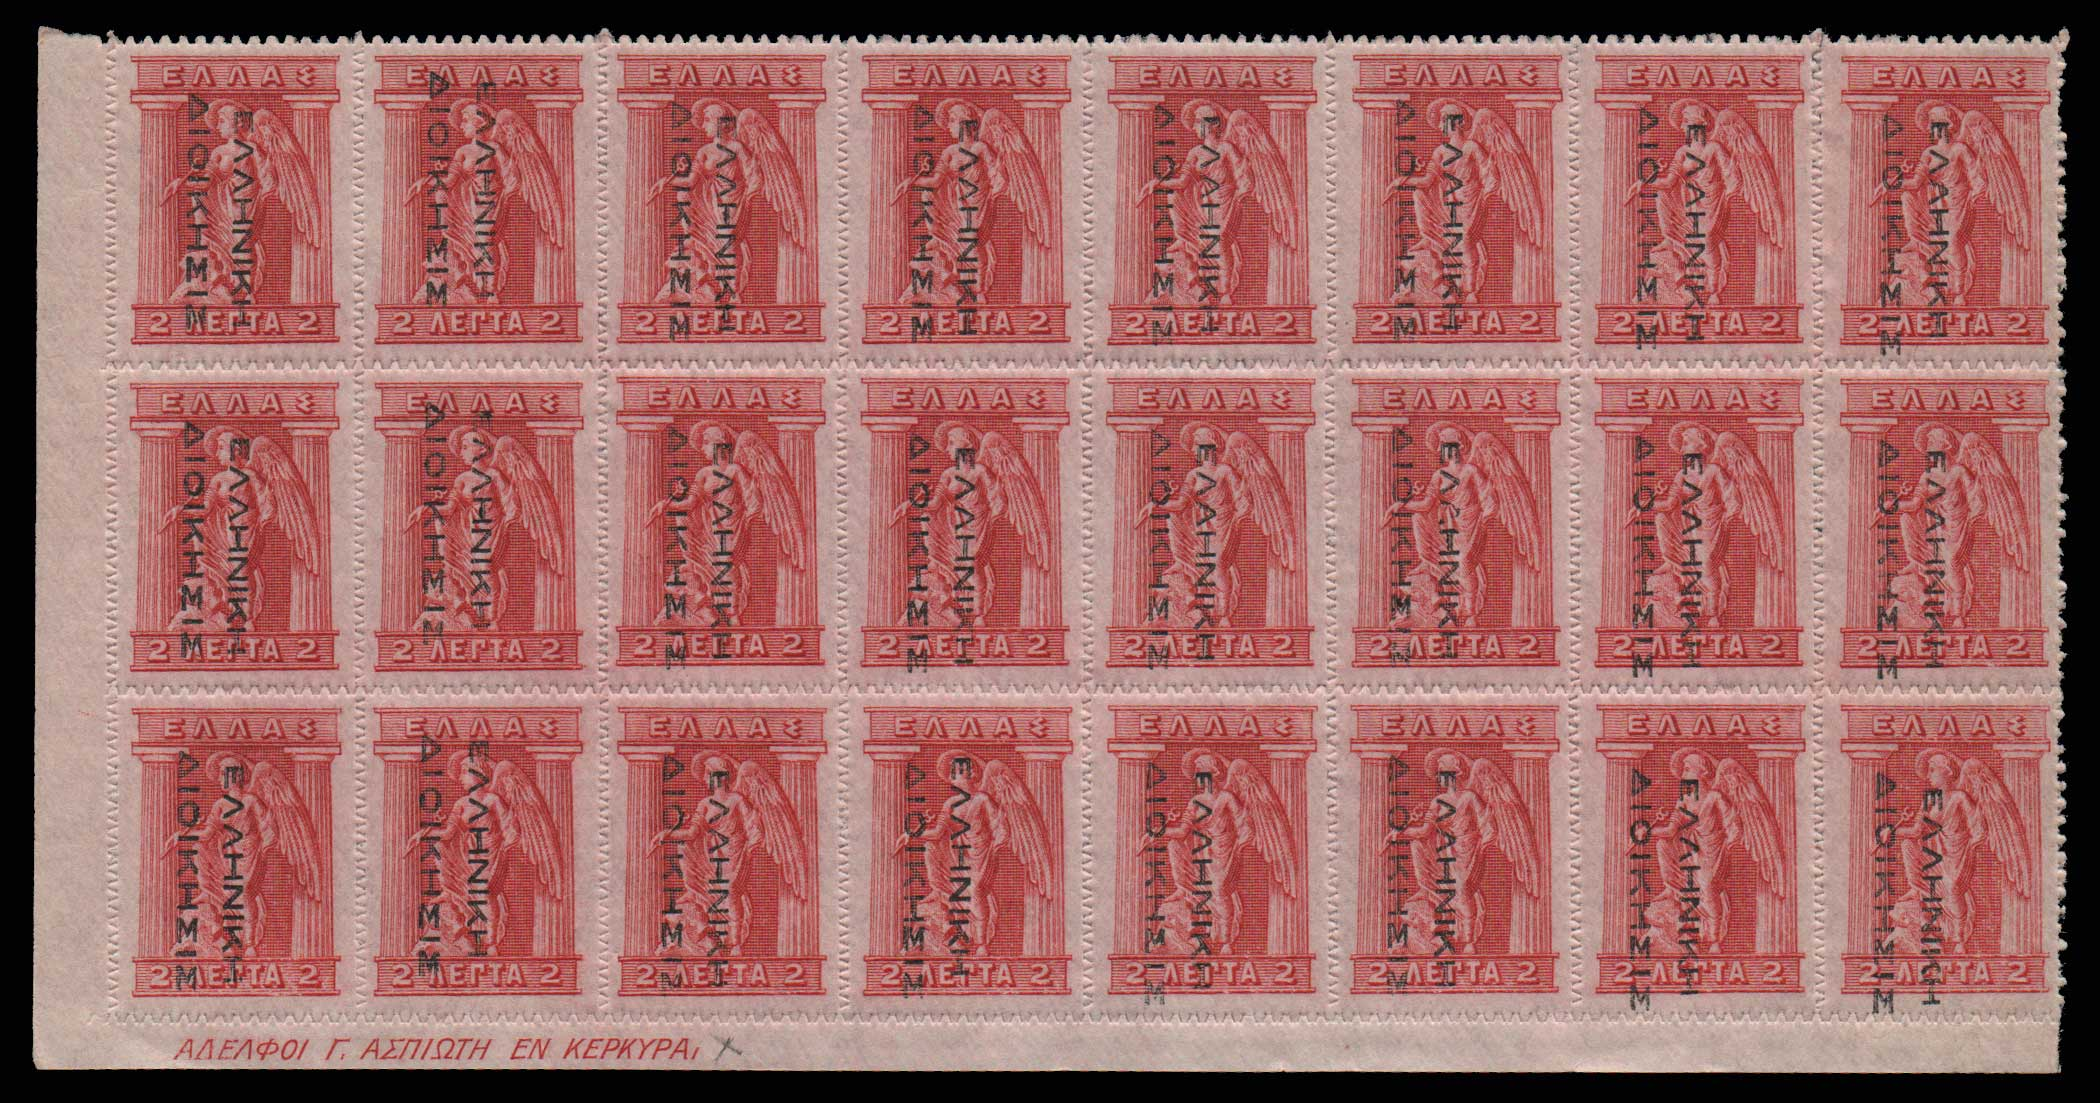 Lot 639 - GREECE-  1911 - 1923 ΕΛΛΗΝΙΚΗΔΙΟΙΚΗΣΙΣ -  Athens Auctions Public Auction 63 General Stamp Sale